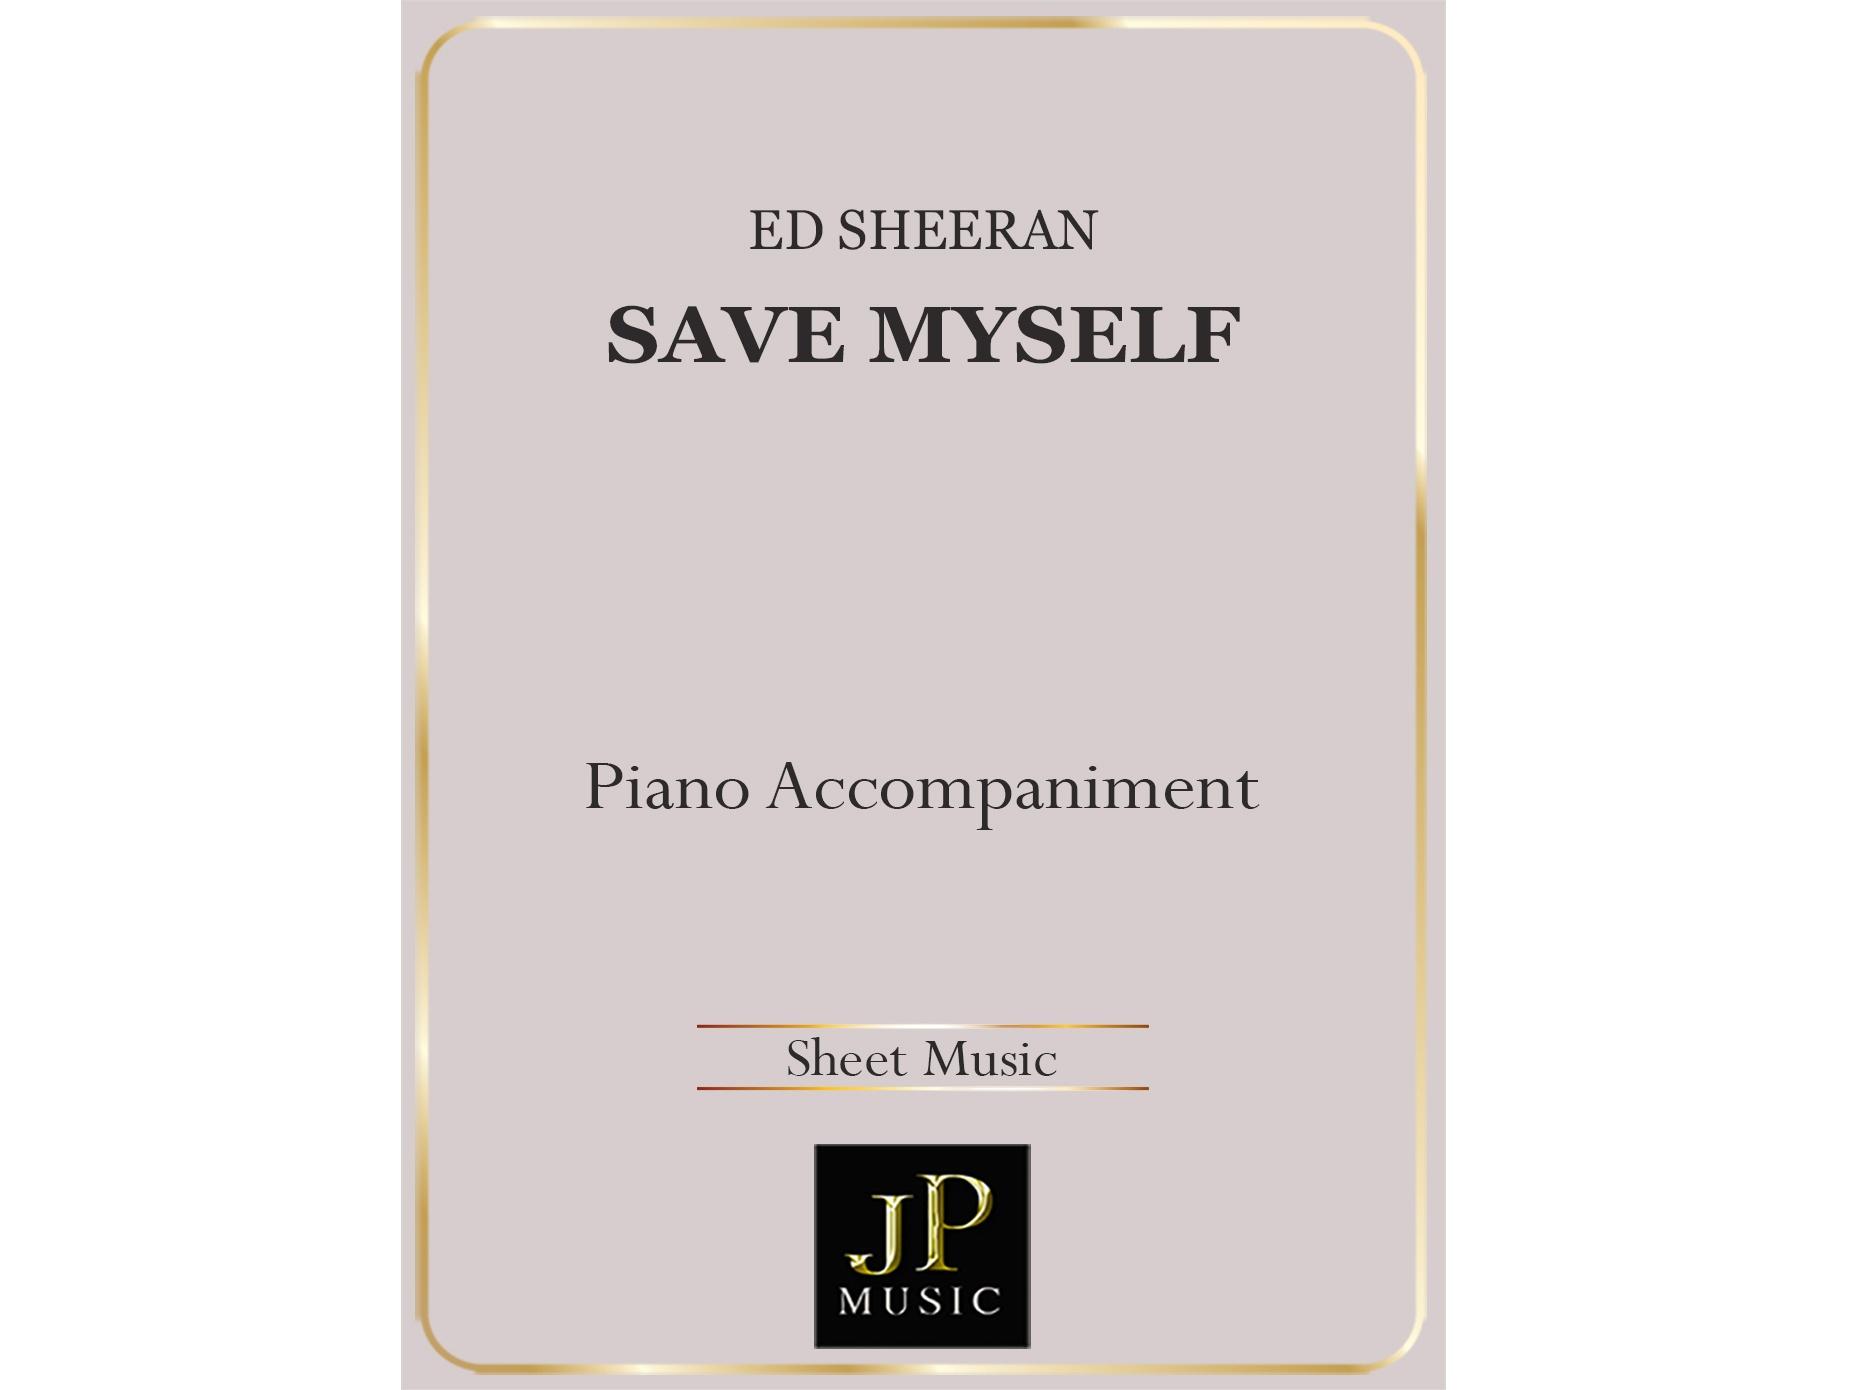 Save Myself - Piano Accompaniment